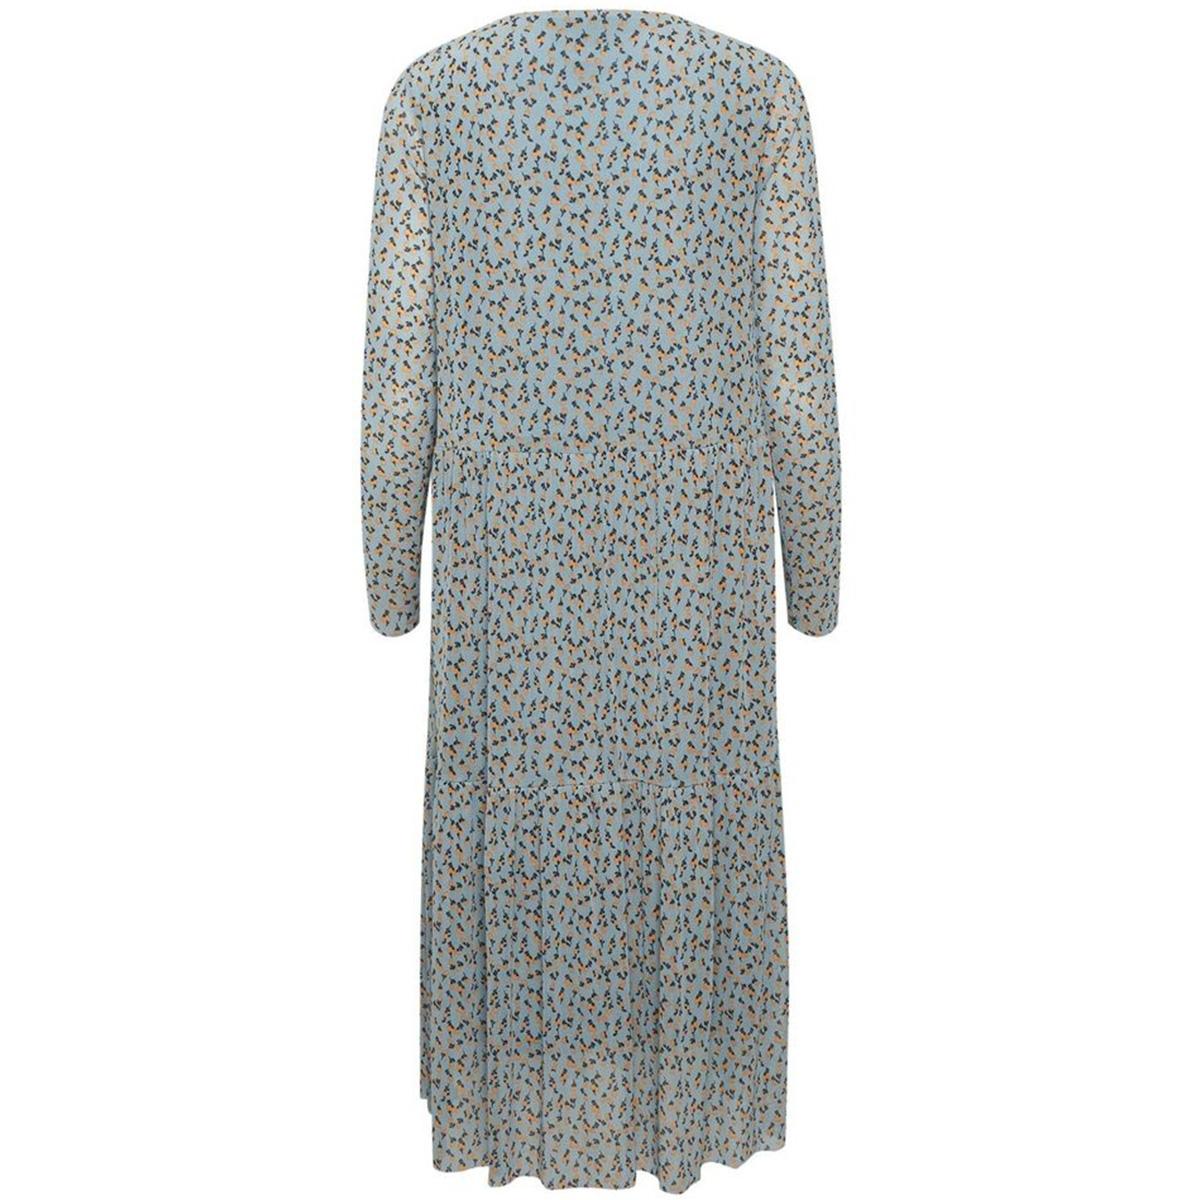 u6571  woven mesh dress l s 30501692 saint tropez jurk 17 4412